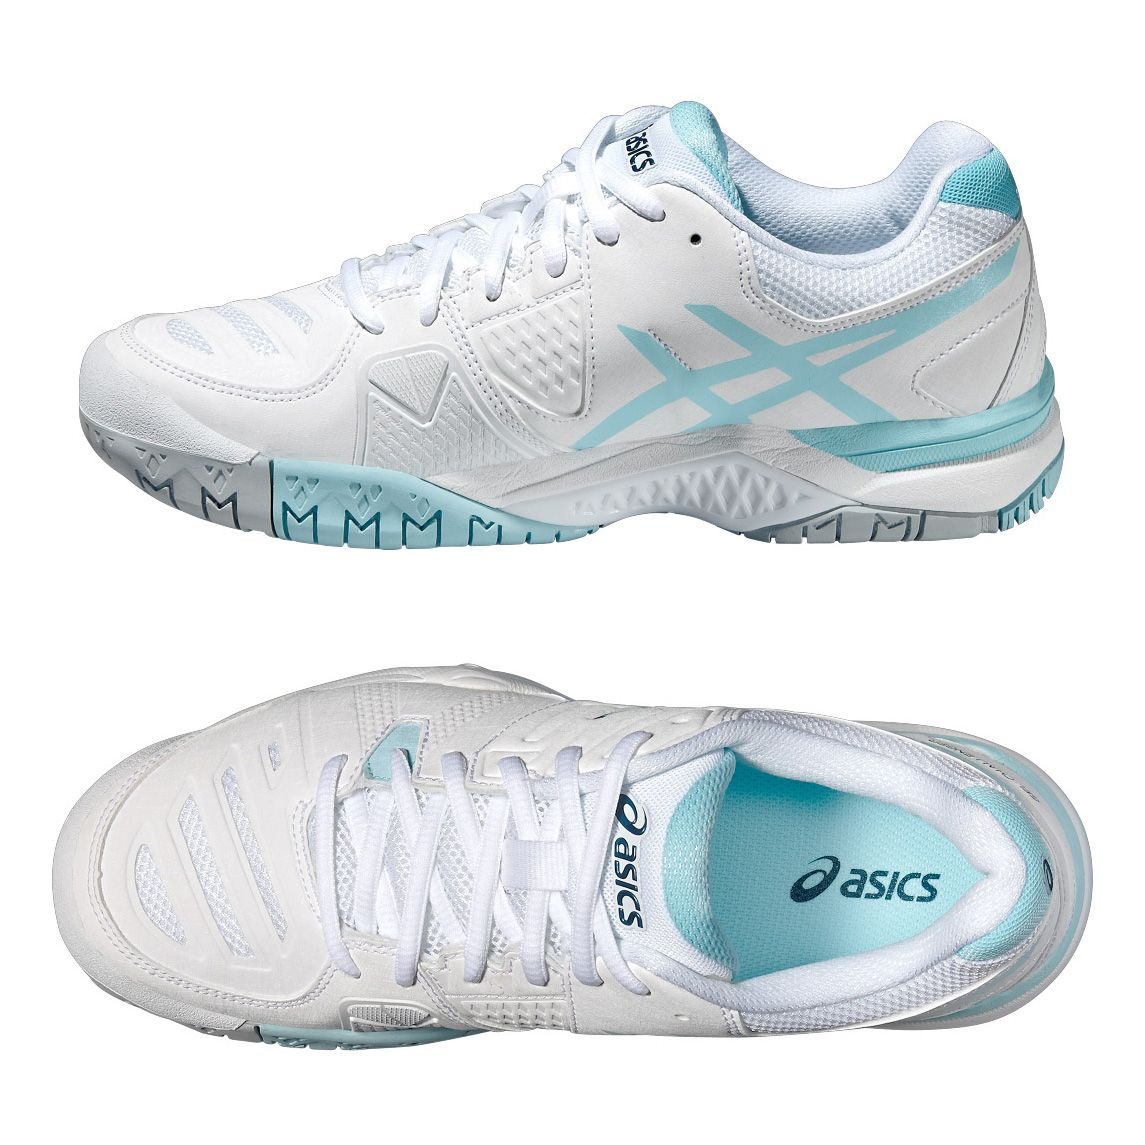 Asics Memory Foam Running Shoes